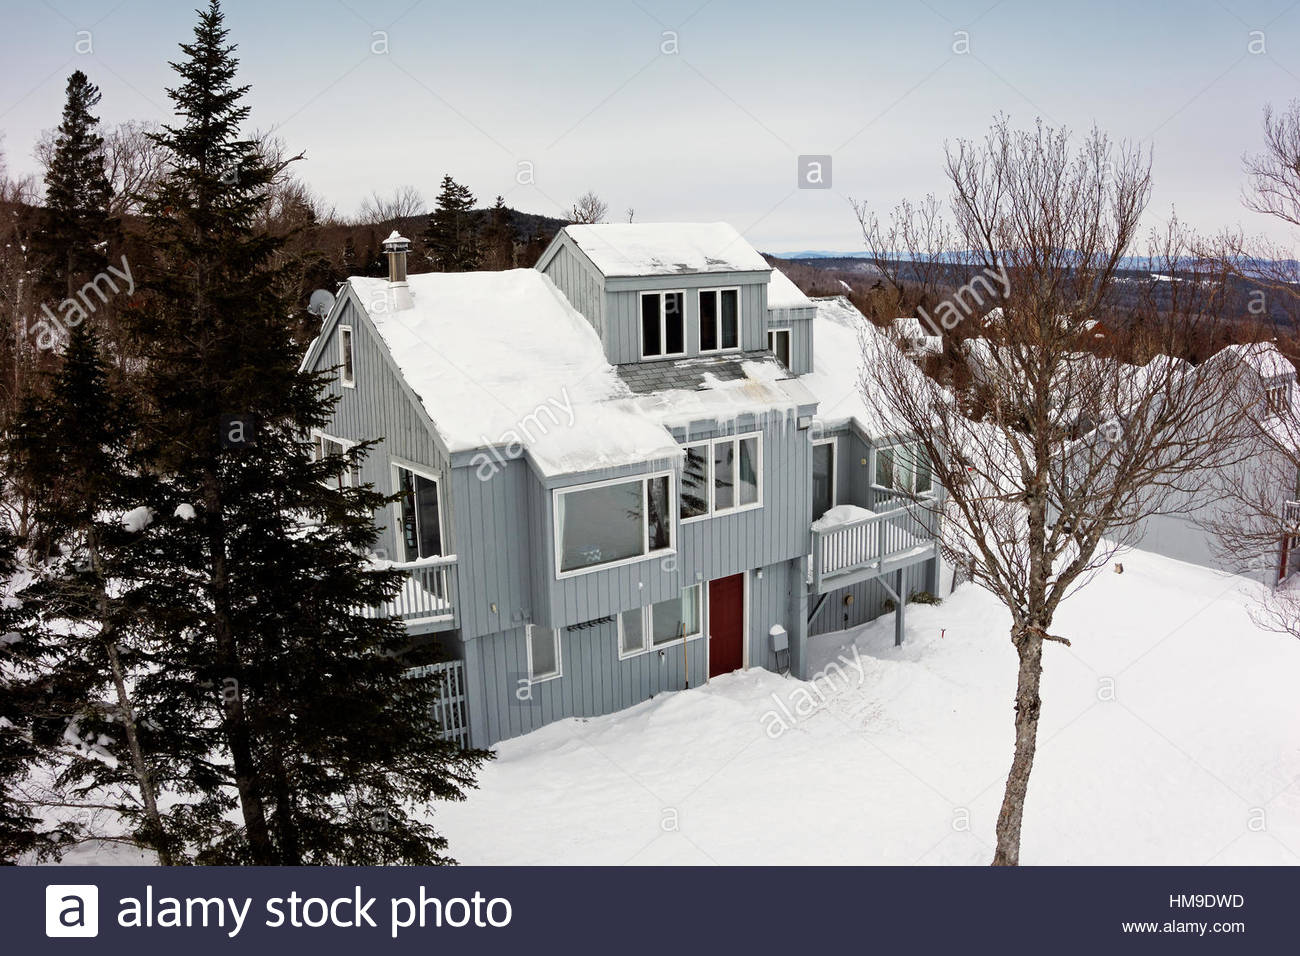 Lodging at Saddleback ski area, Sandy River Plantation, Maine, USA - Stock Image